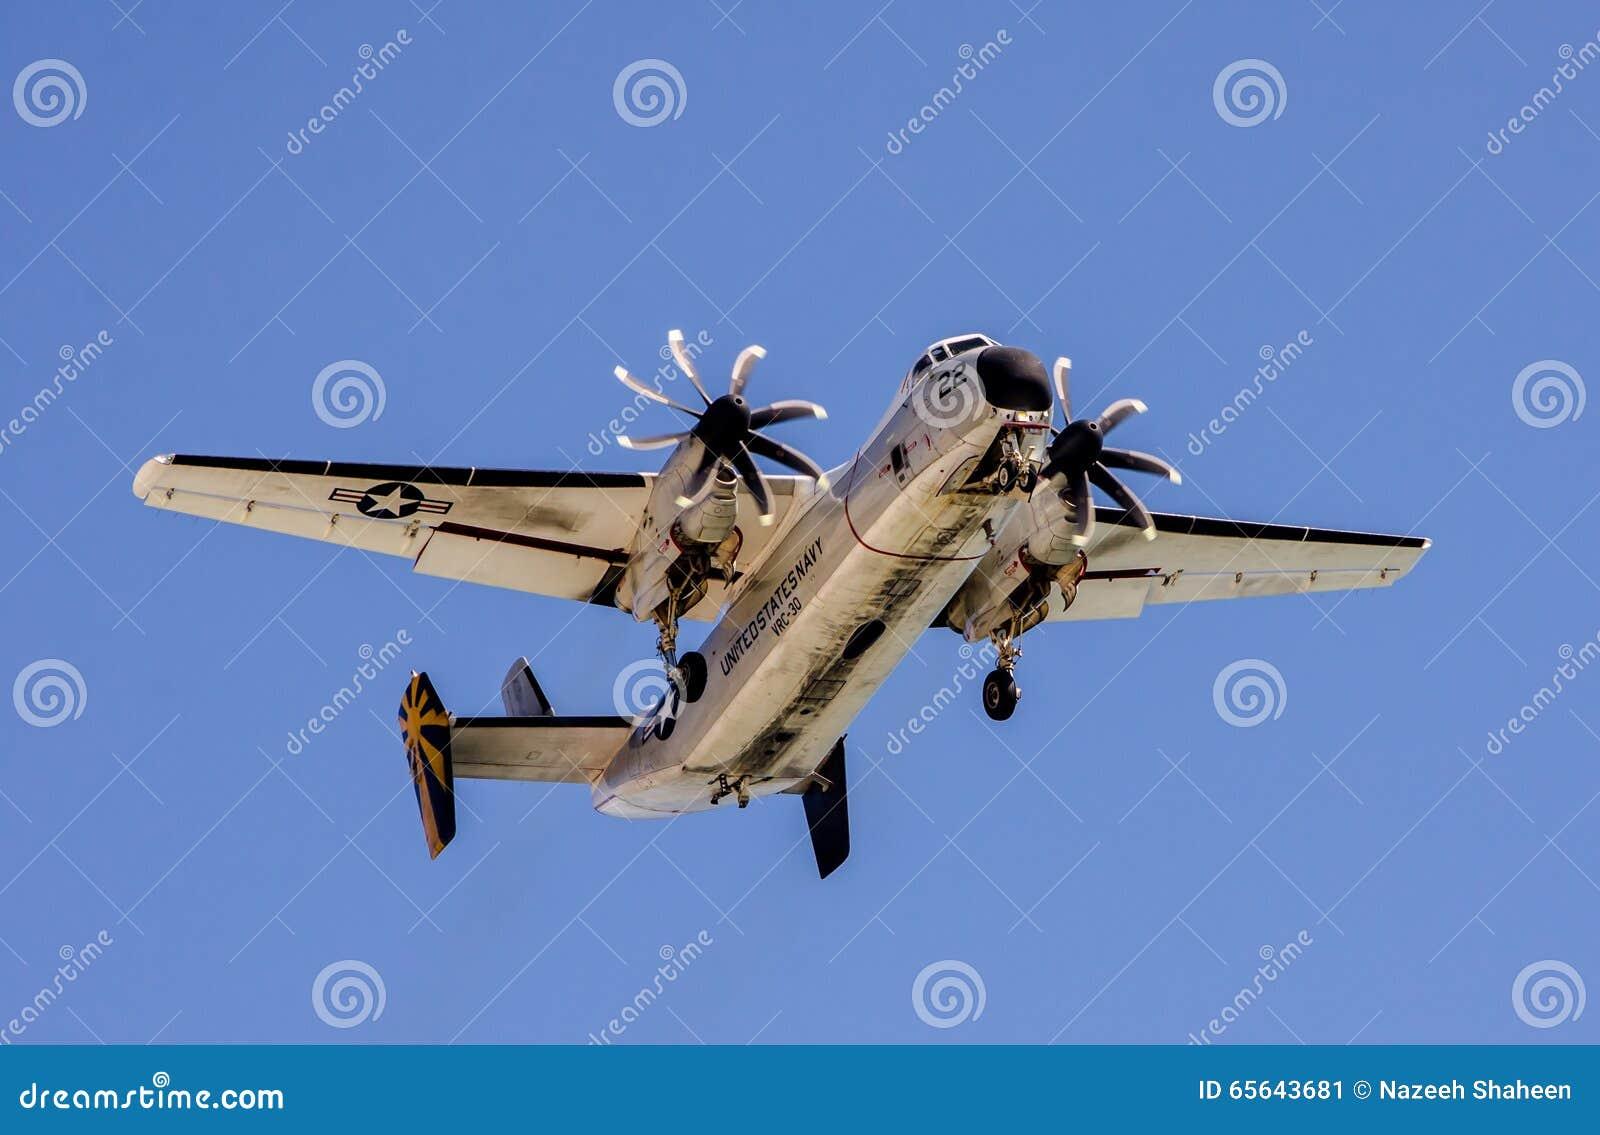 Avion de guerre en vol dans le ciel